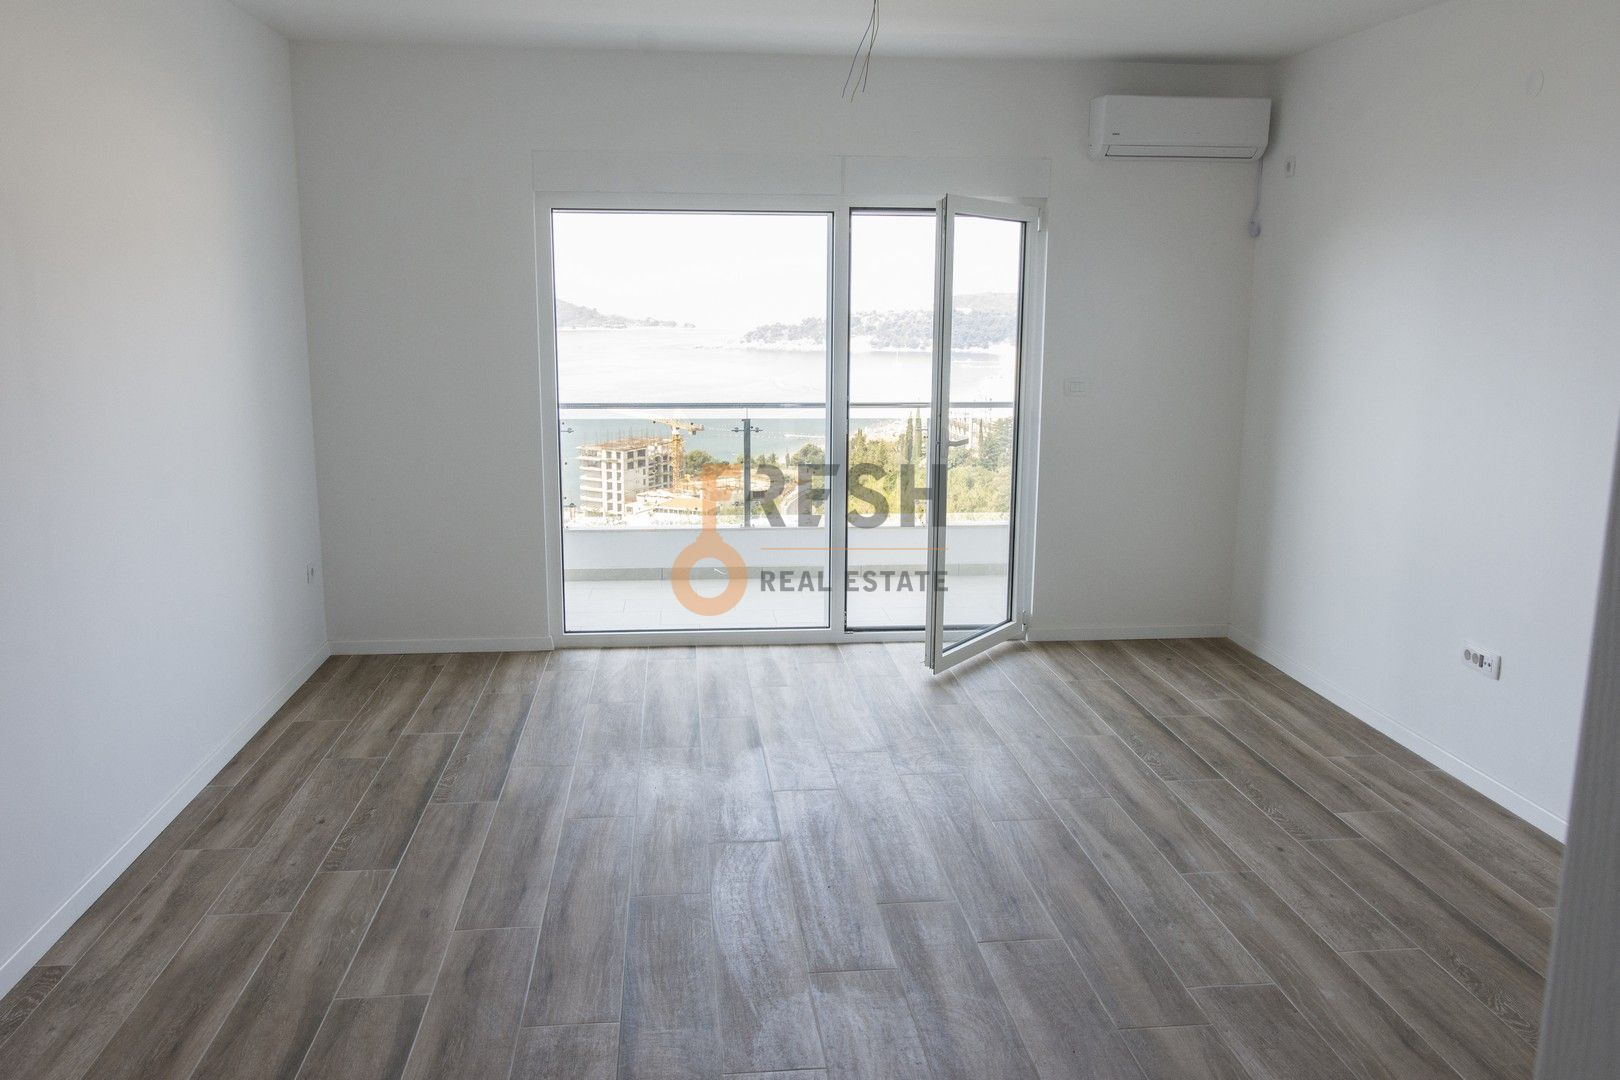 Studio apartnan - garsonjera, 35m2, Rafailovići, Prodaja - 3